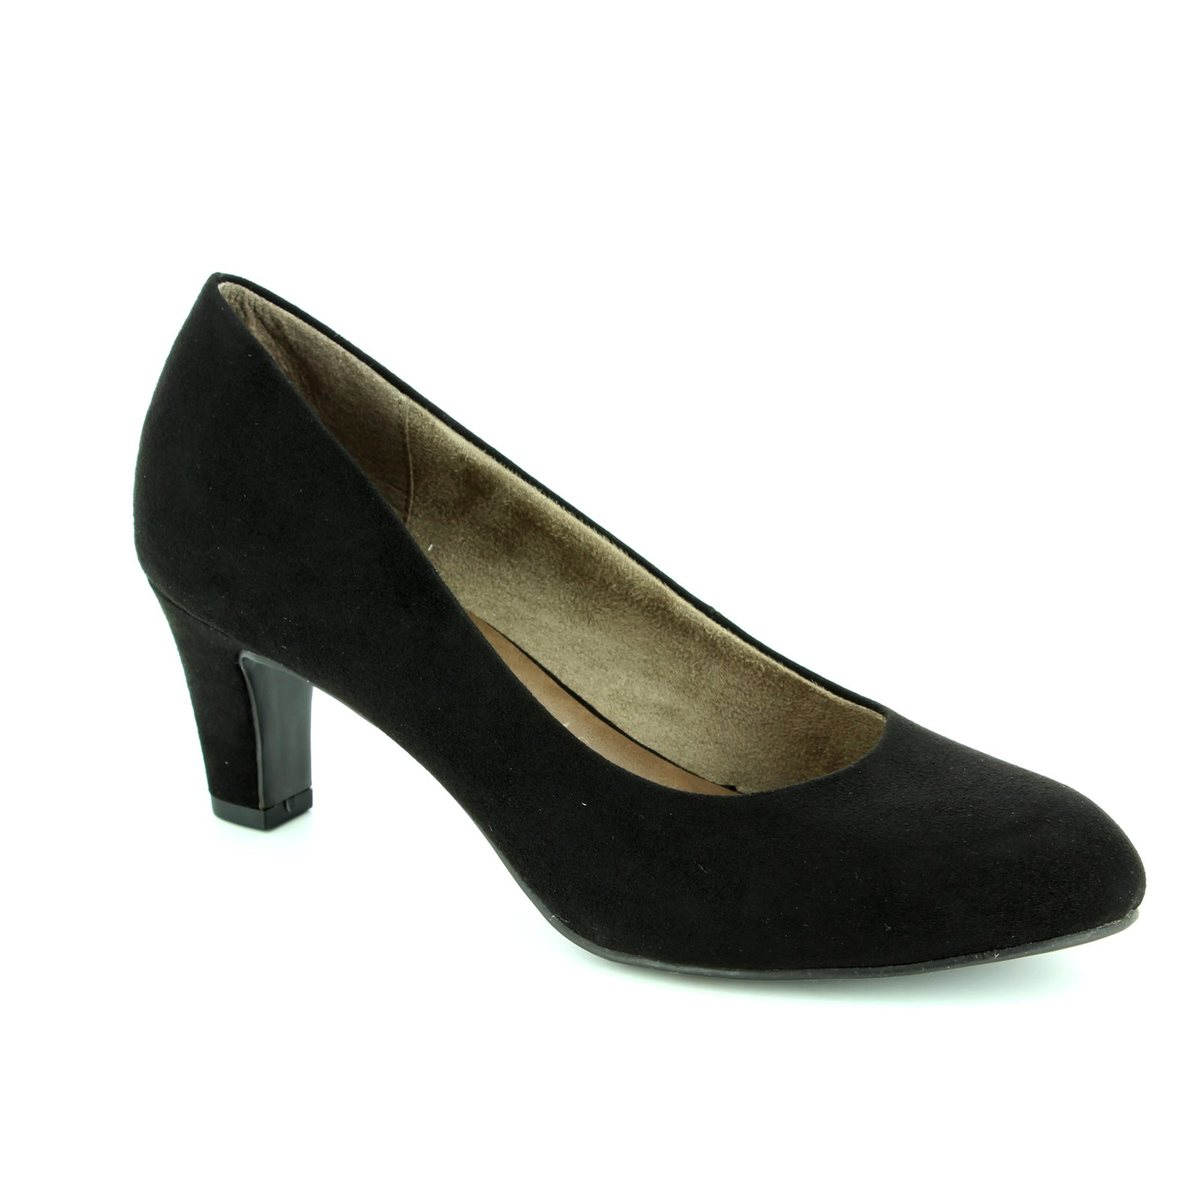 tamaris caxias 22418 001 black high heeled shoes. Black Bedroom Furniture Sets. Home Design Ideas